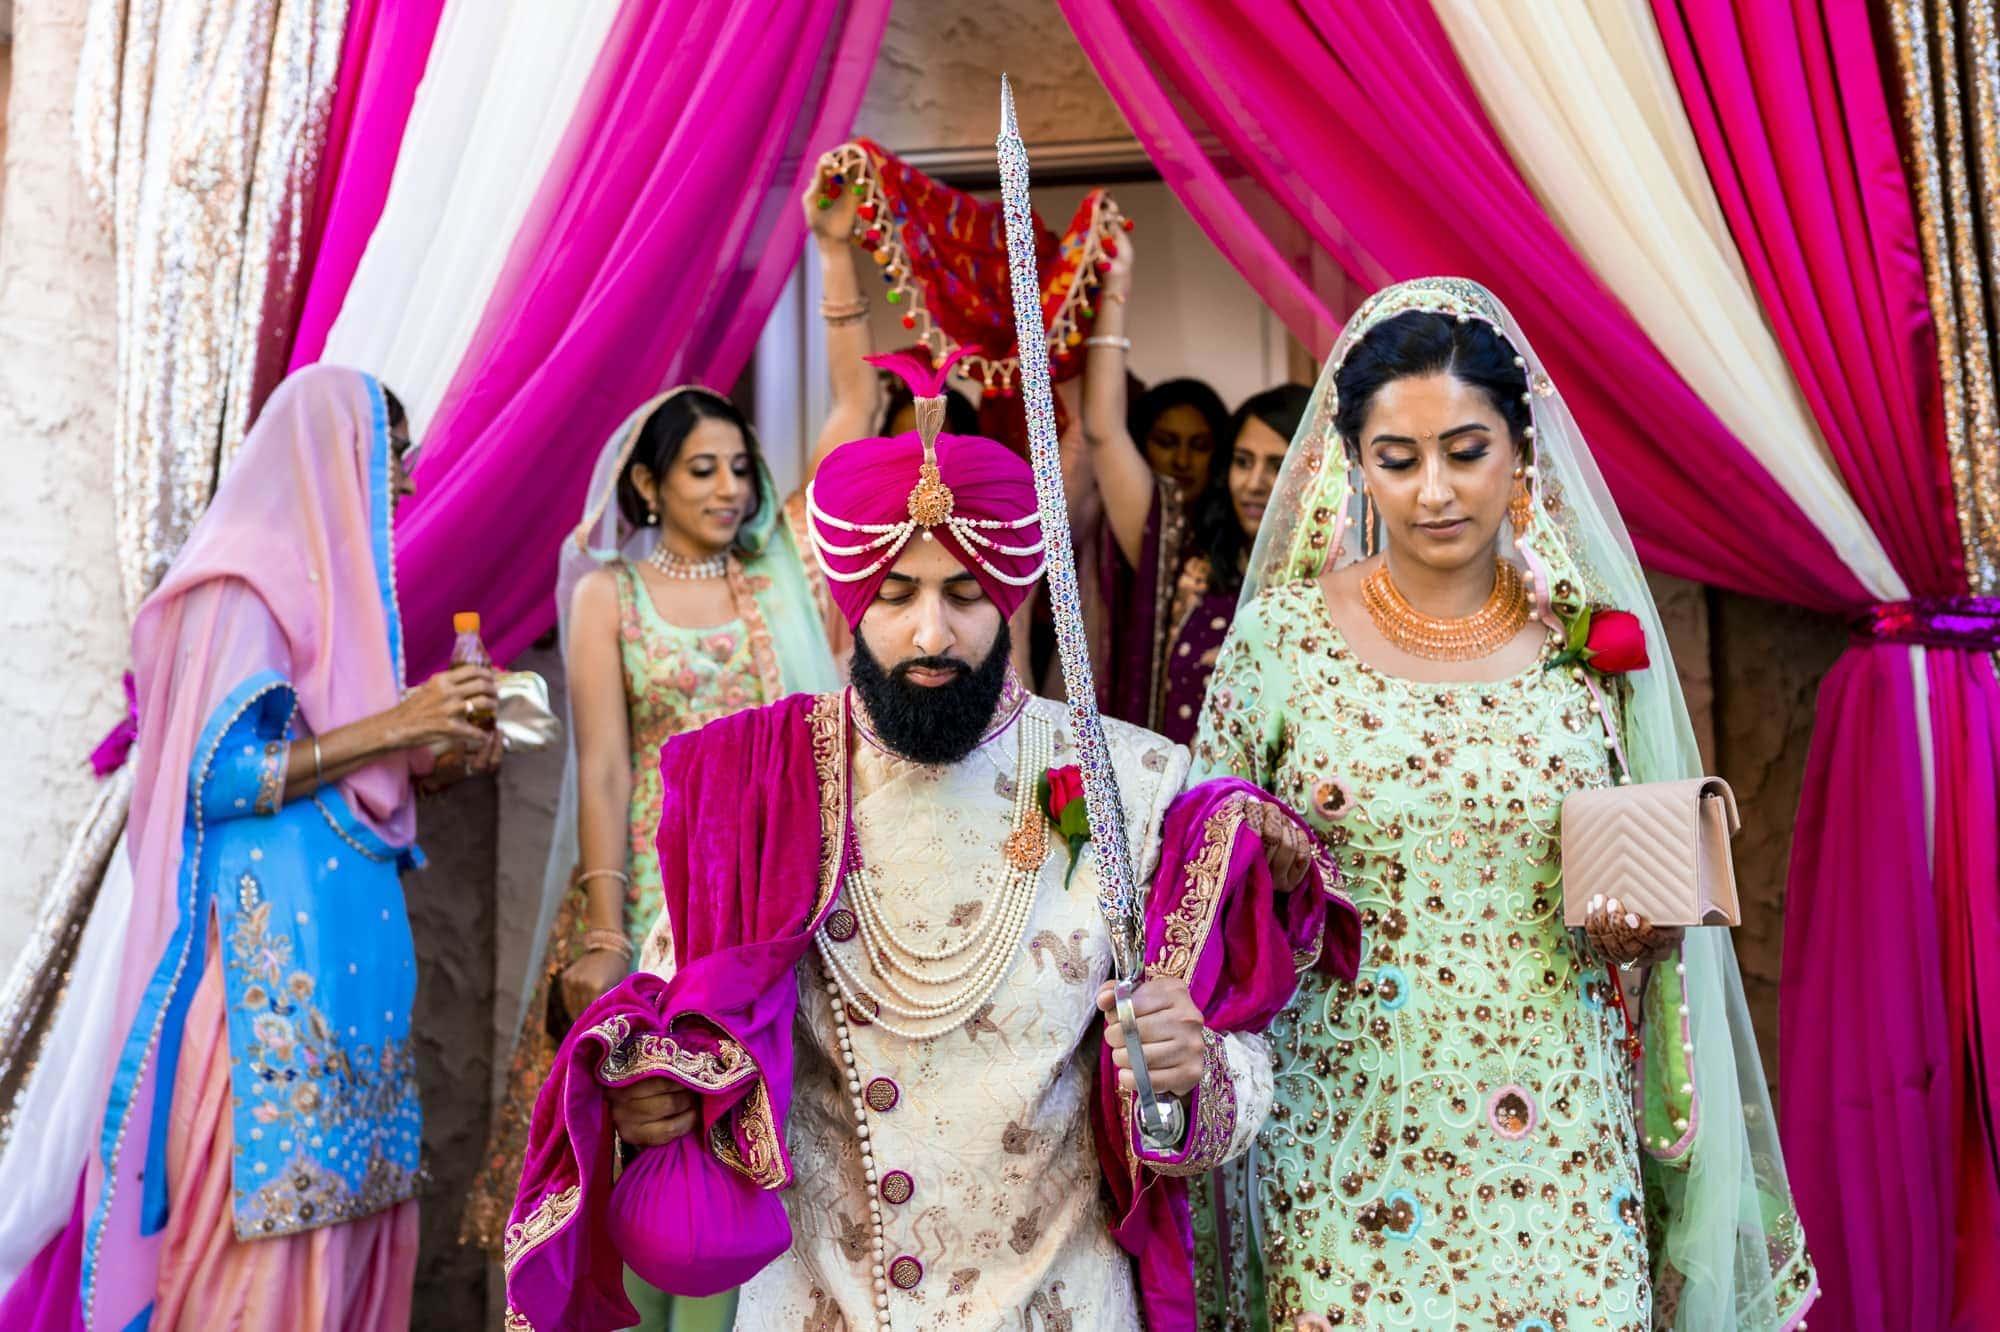 manny-gurdeep-wedding-blog2-27